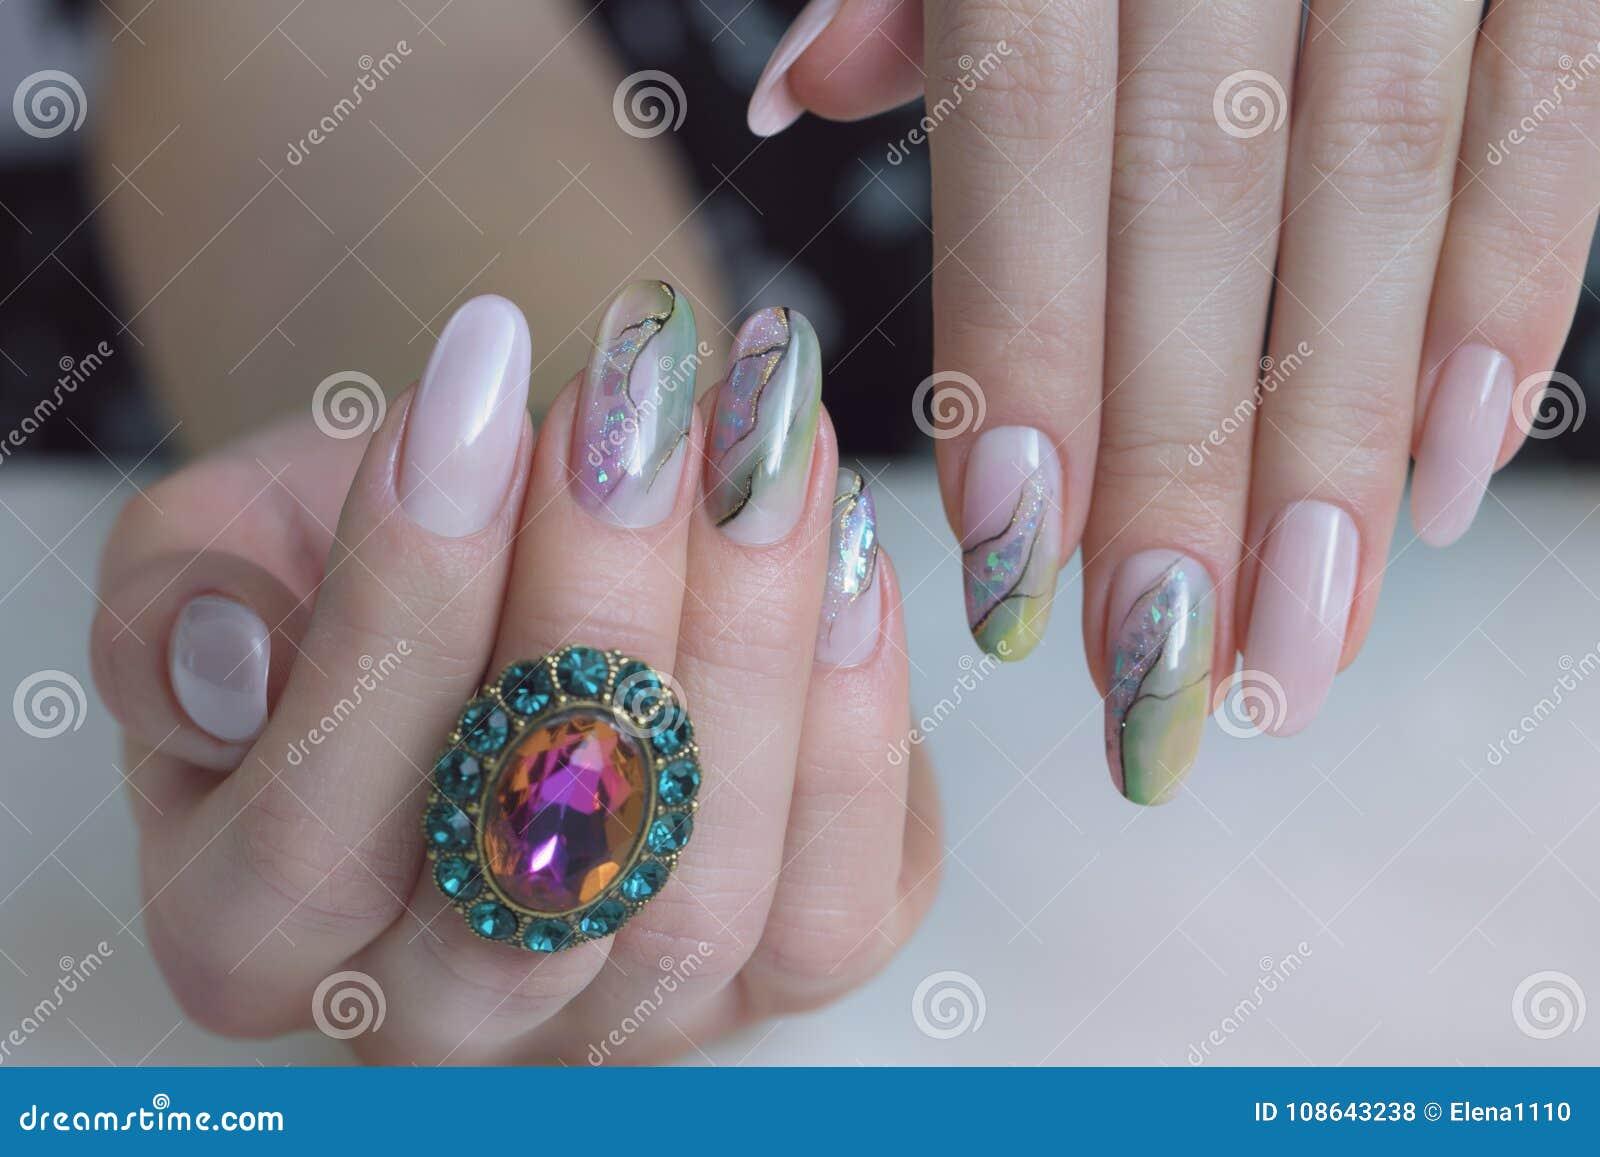 Belles Mains Femelles Avec Des Ongles Manucures Photo Stock Image Du Fond Rose 108643238